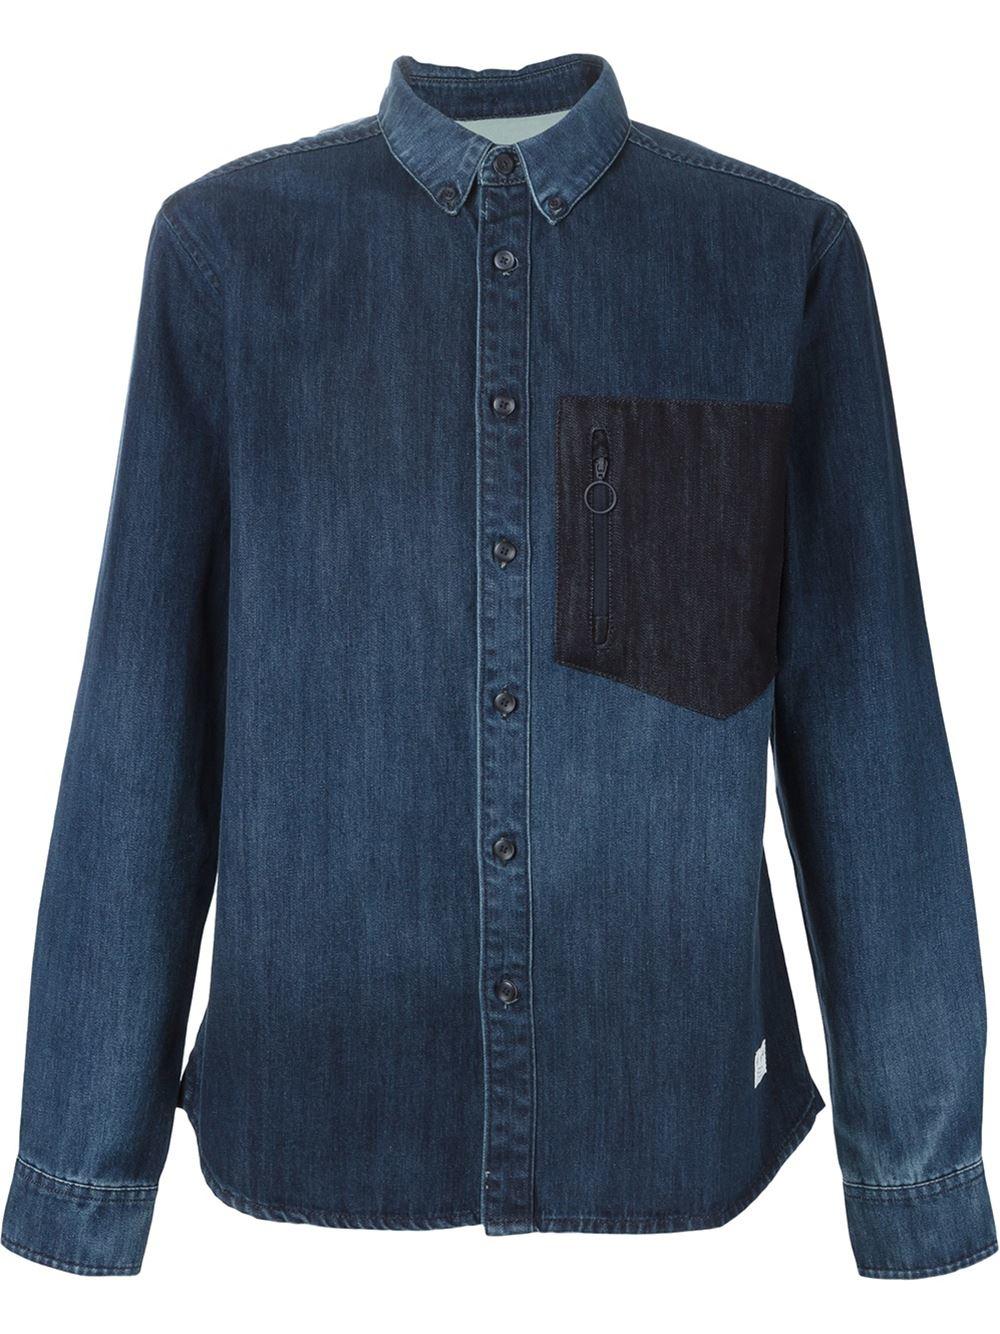 Adidas originals button down denim shirt in blue for men for Denim button down shirts